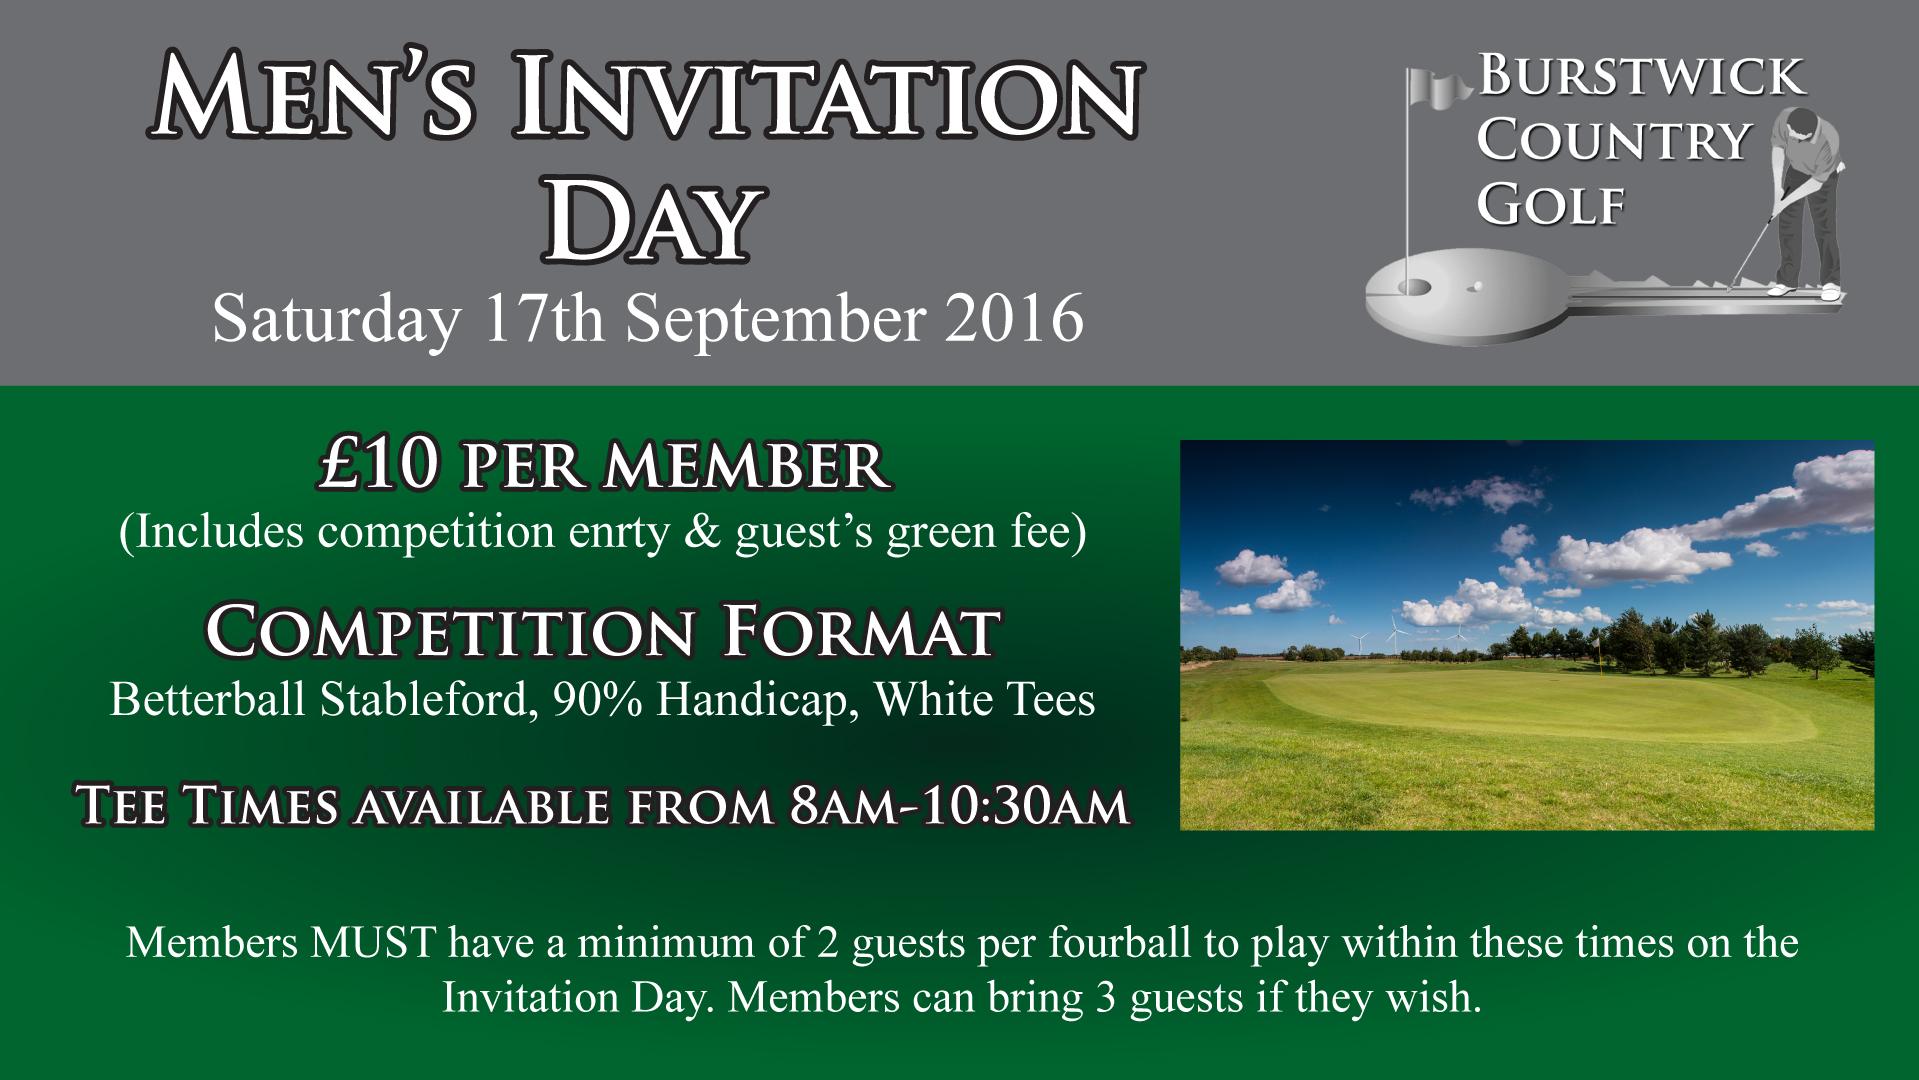 Men's Invitation Day at Burstwick, near Hull